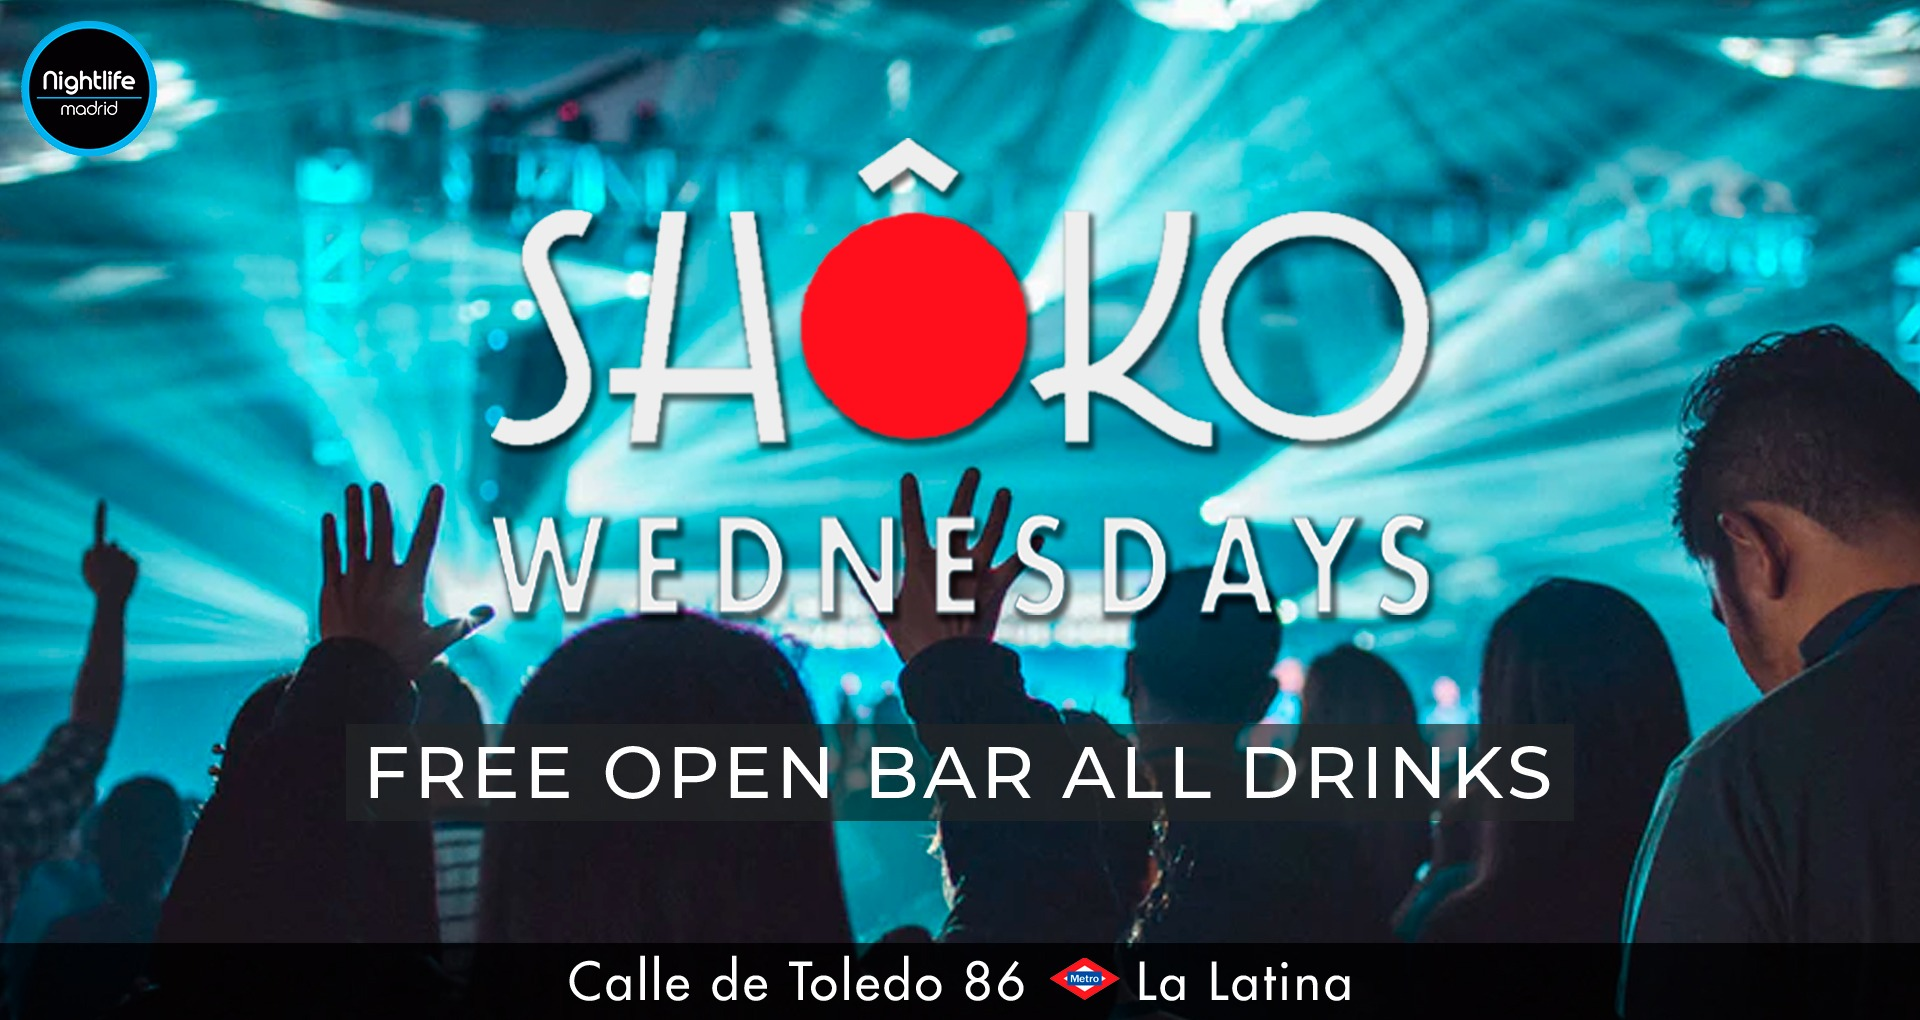 Shoko Wednesdays - Club Shoko Madrid